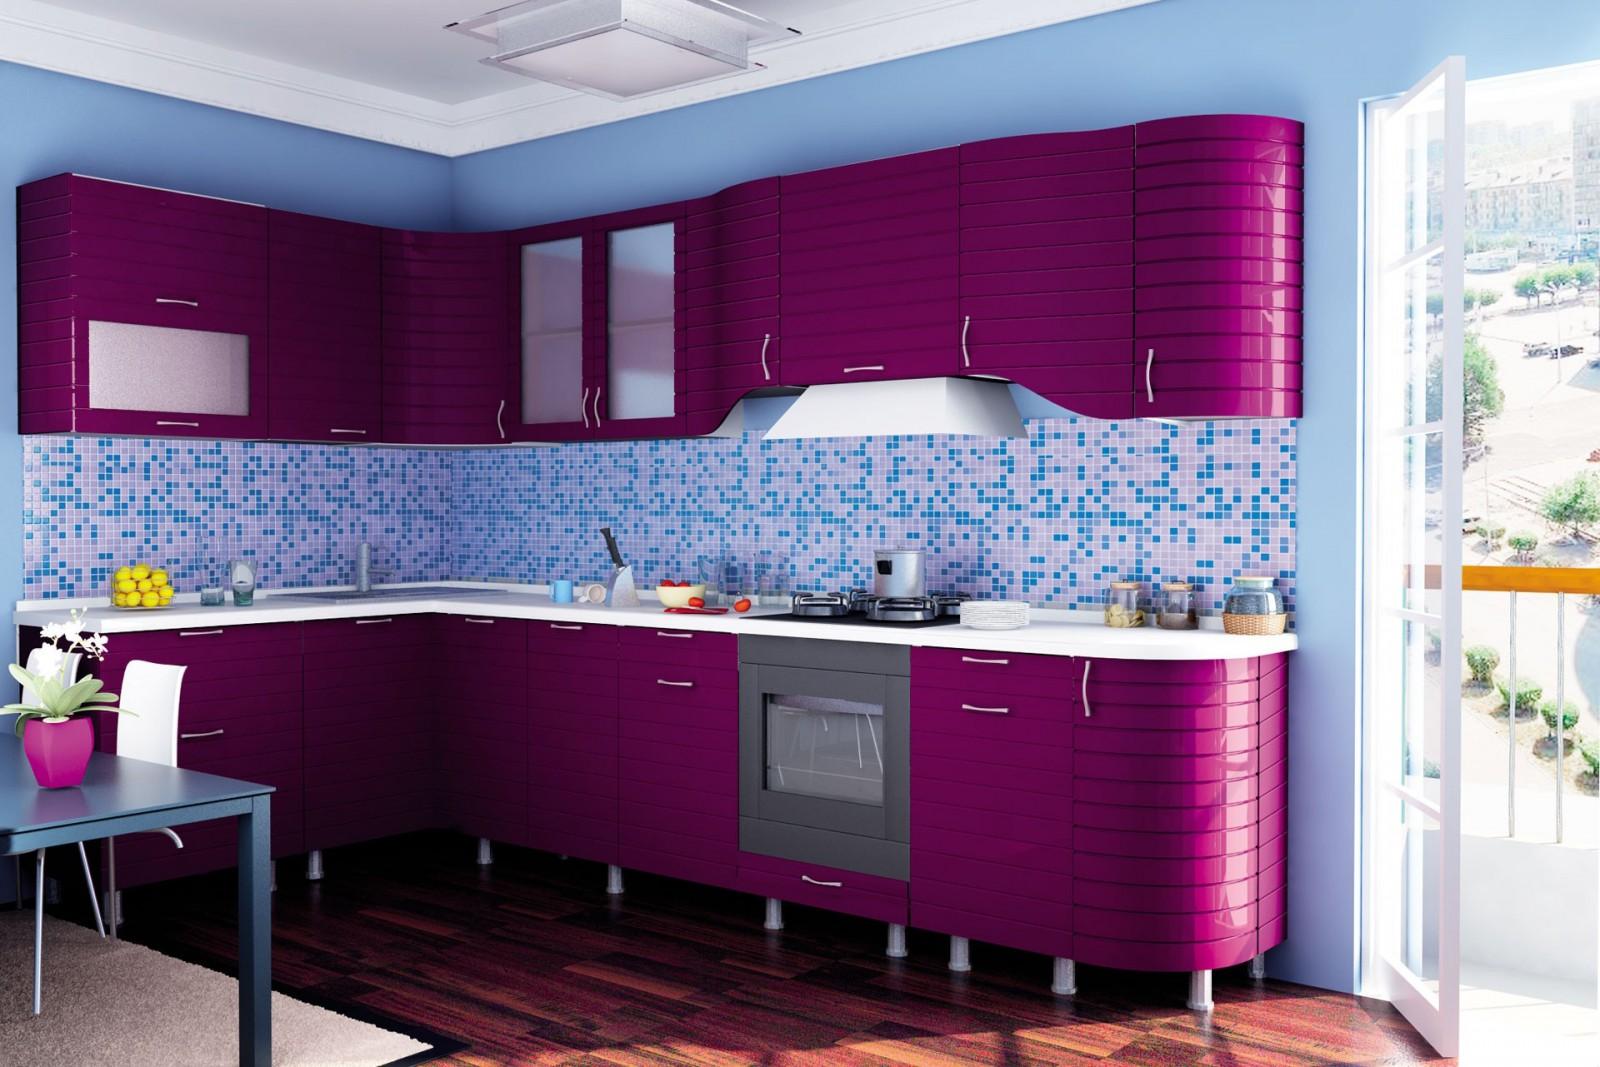 Сиренево-голубая кухня